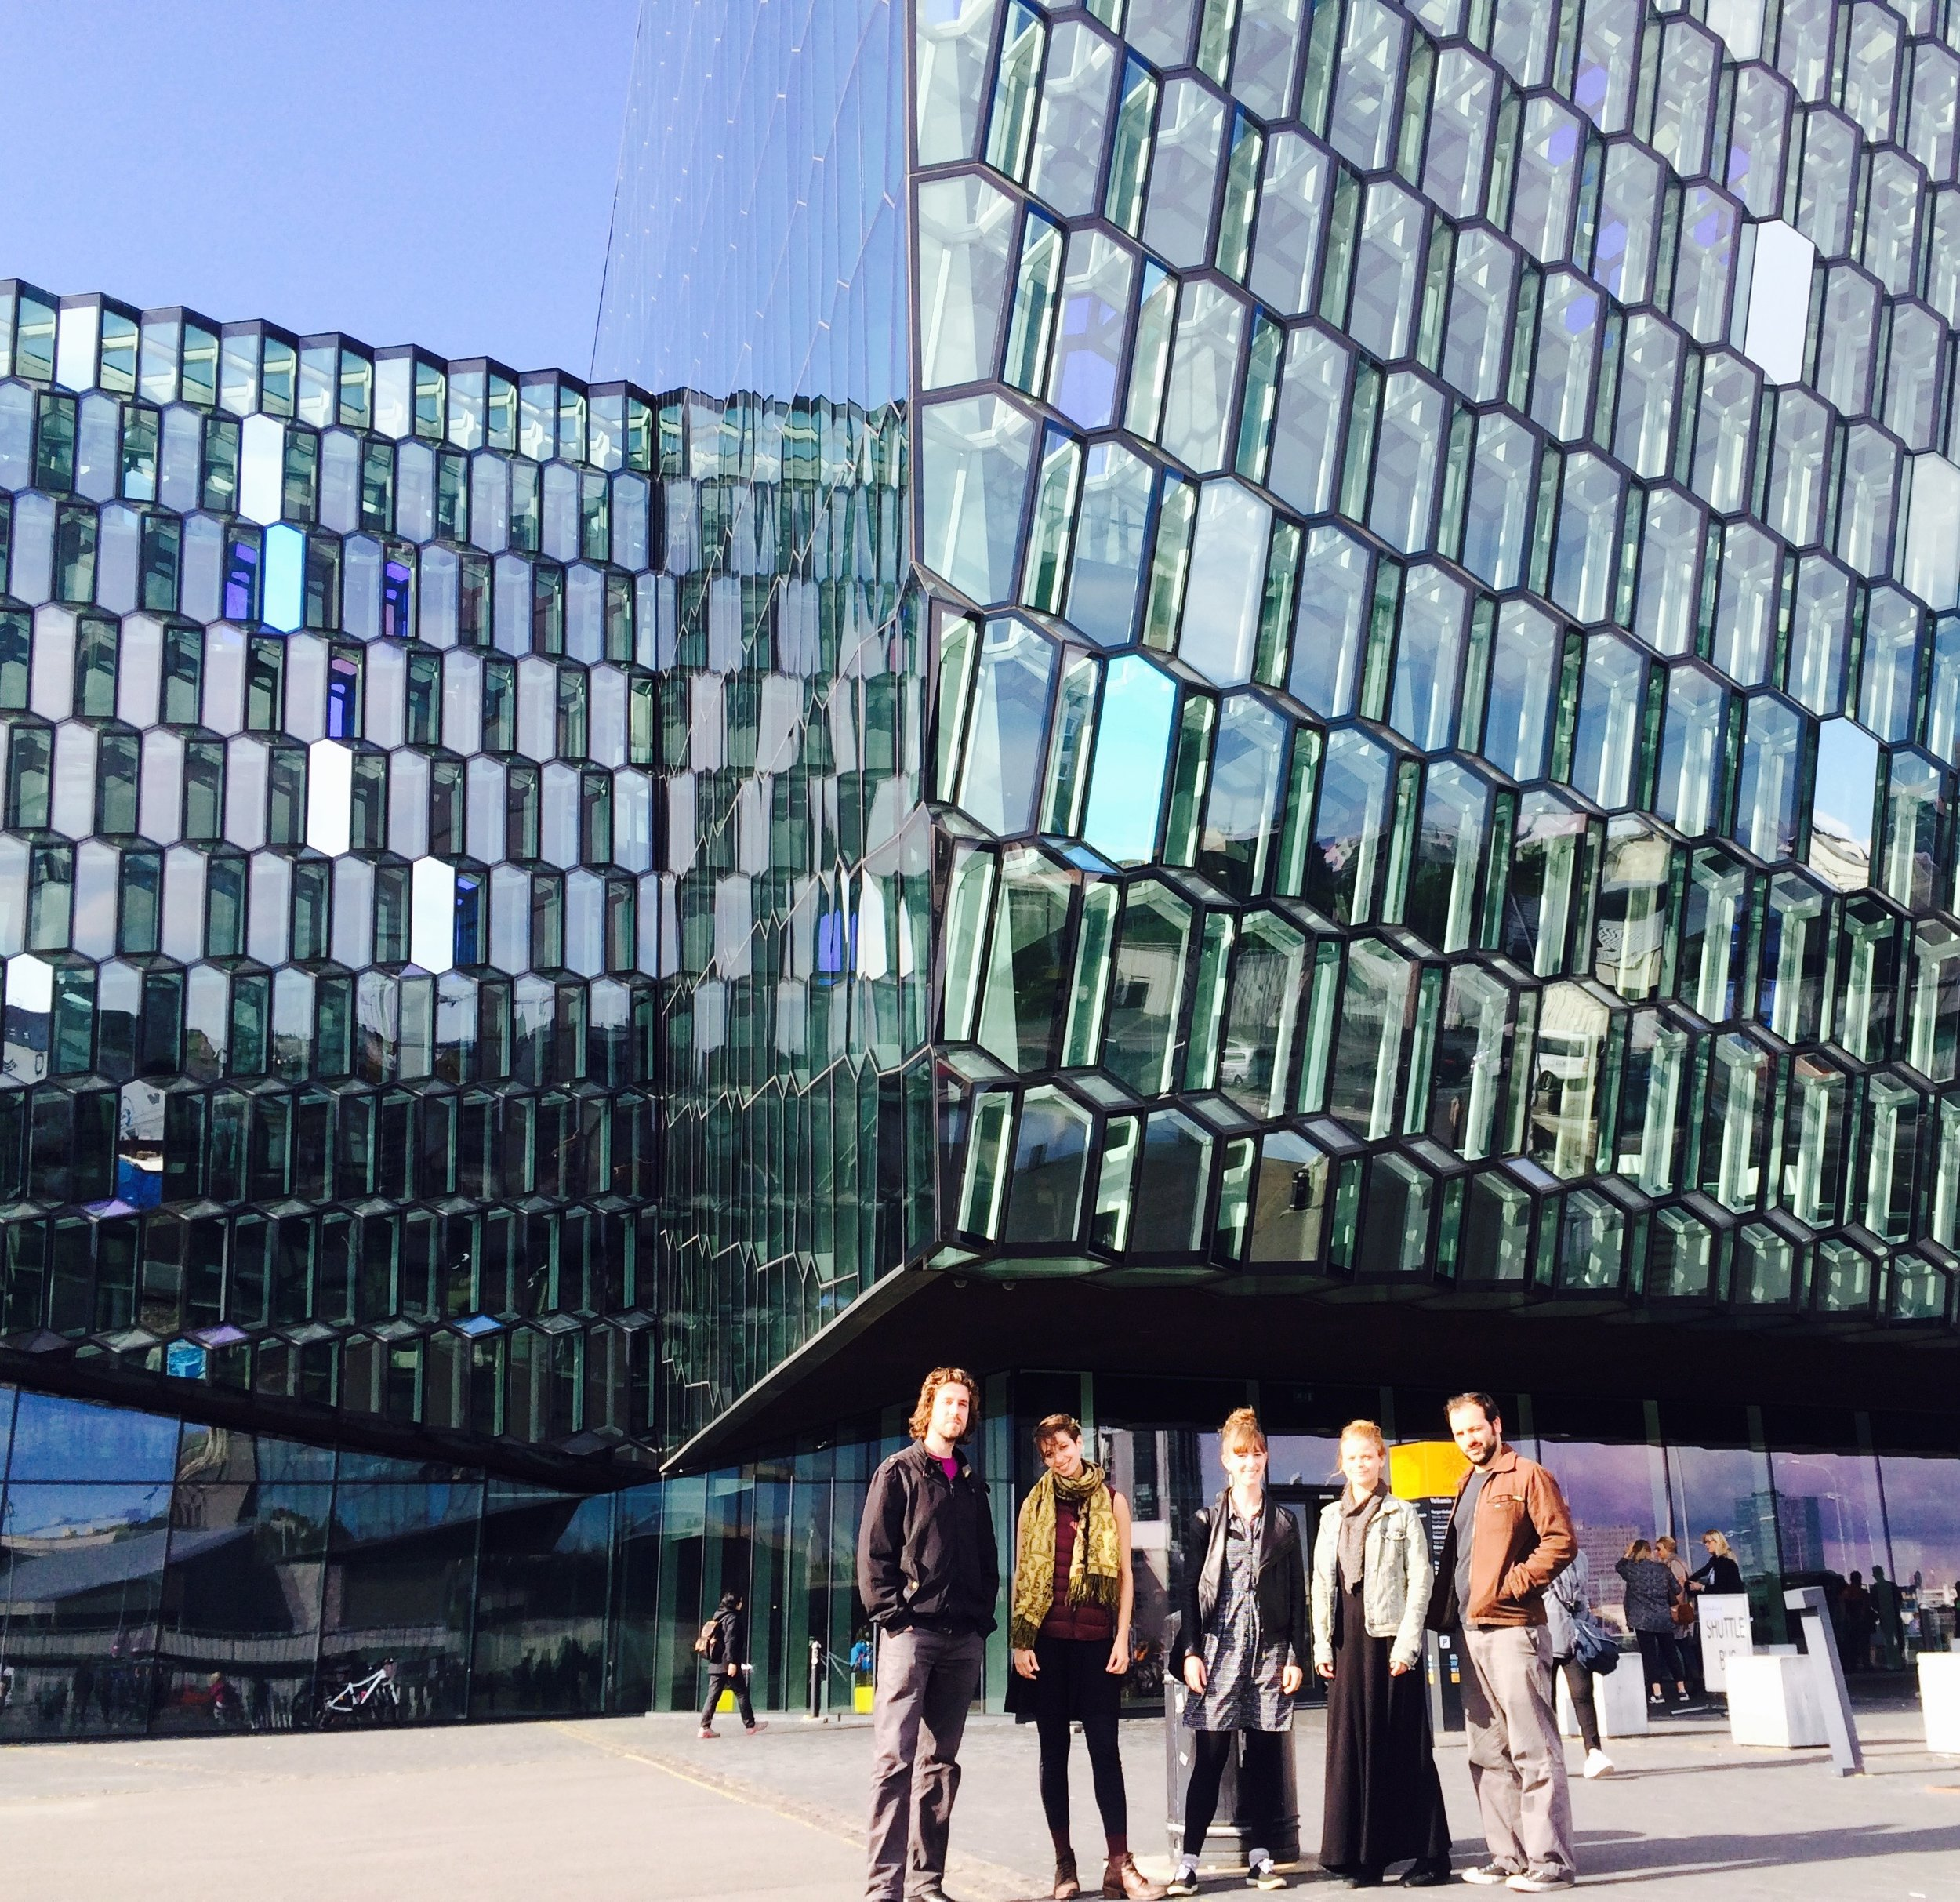 TAK at Harpa Concert hall in Reykjavík, Iceland as part of their Summer 2016 erraTAK tour